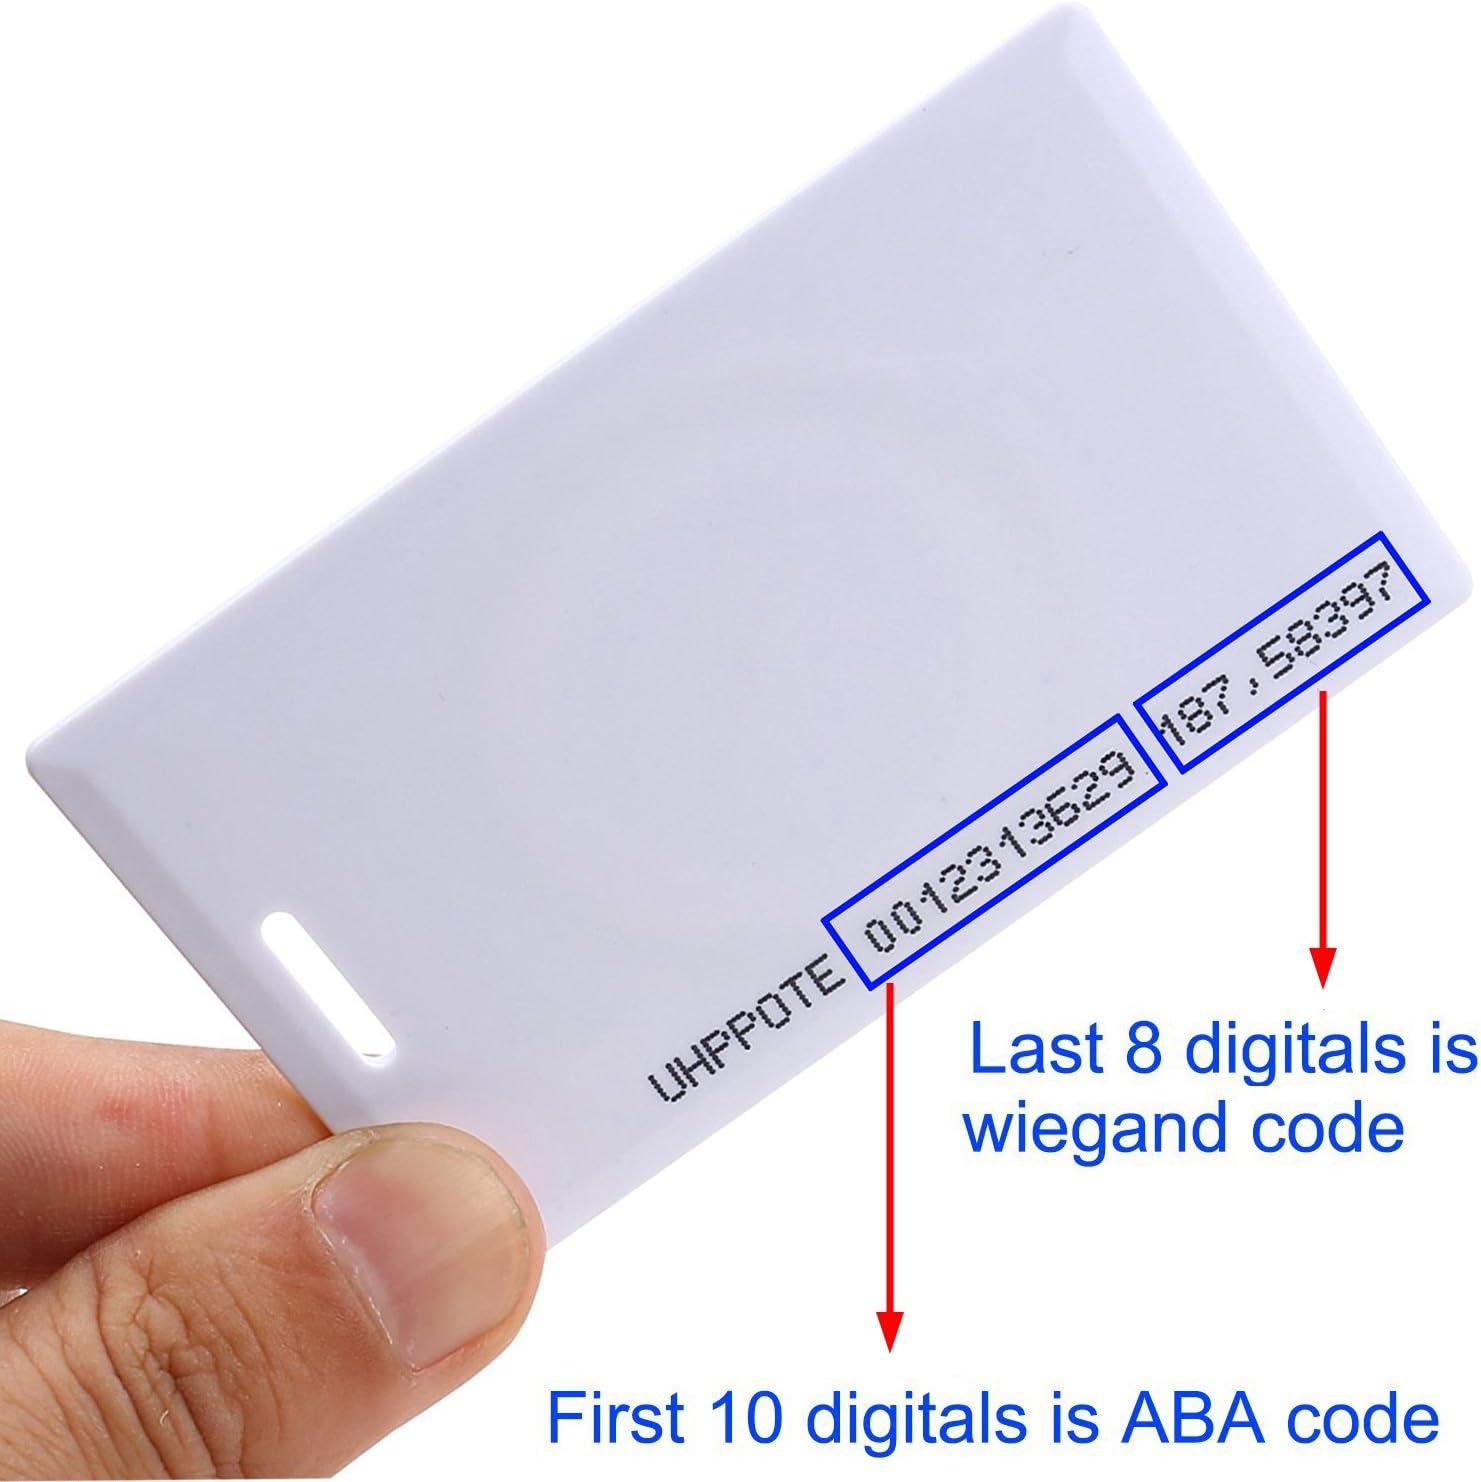 UHPPOTE Sin Contacto 125kHz EM4100 RFID Proximidad ID Peque/ño Tarjeta De Entrada Acceso Espersor 1.8mm 50 Piezas